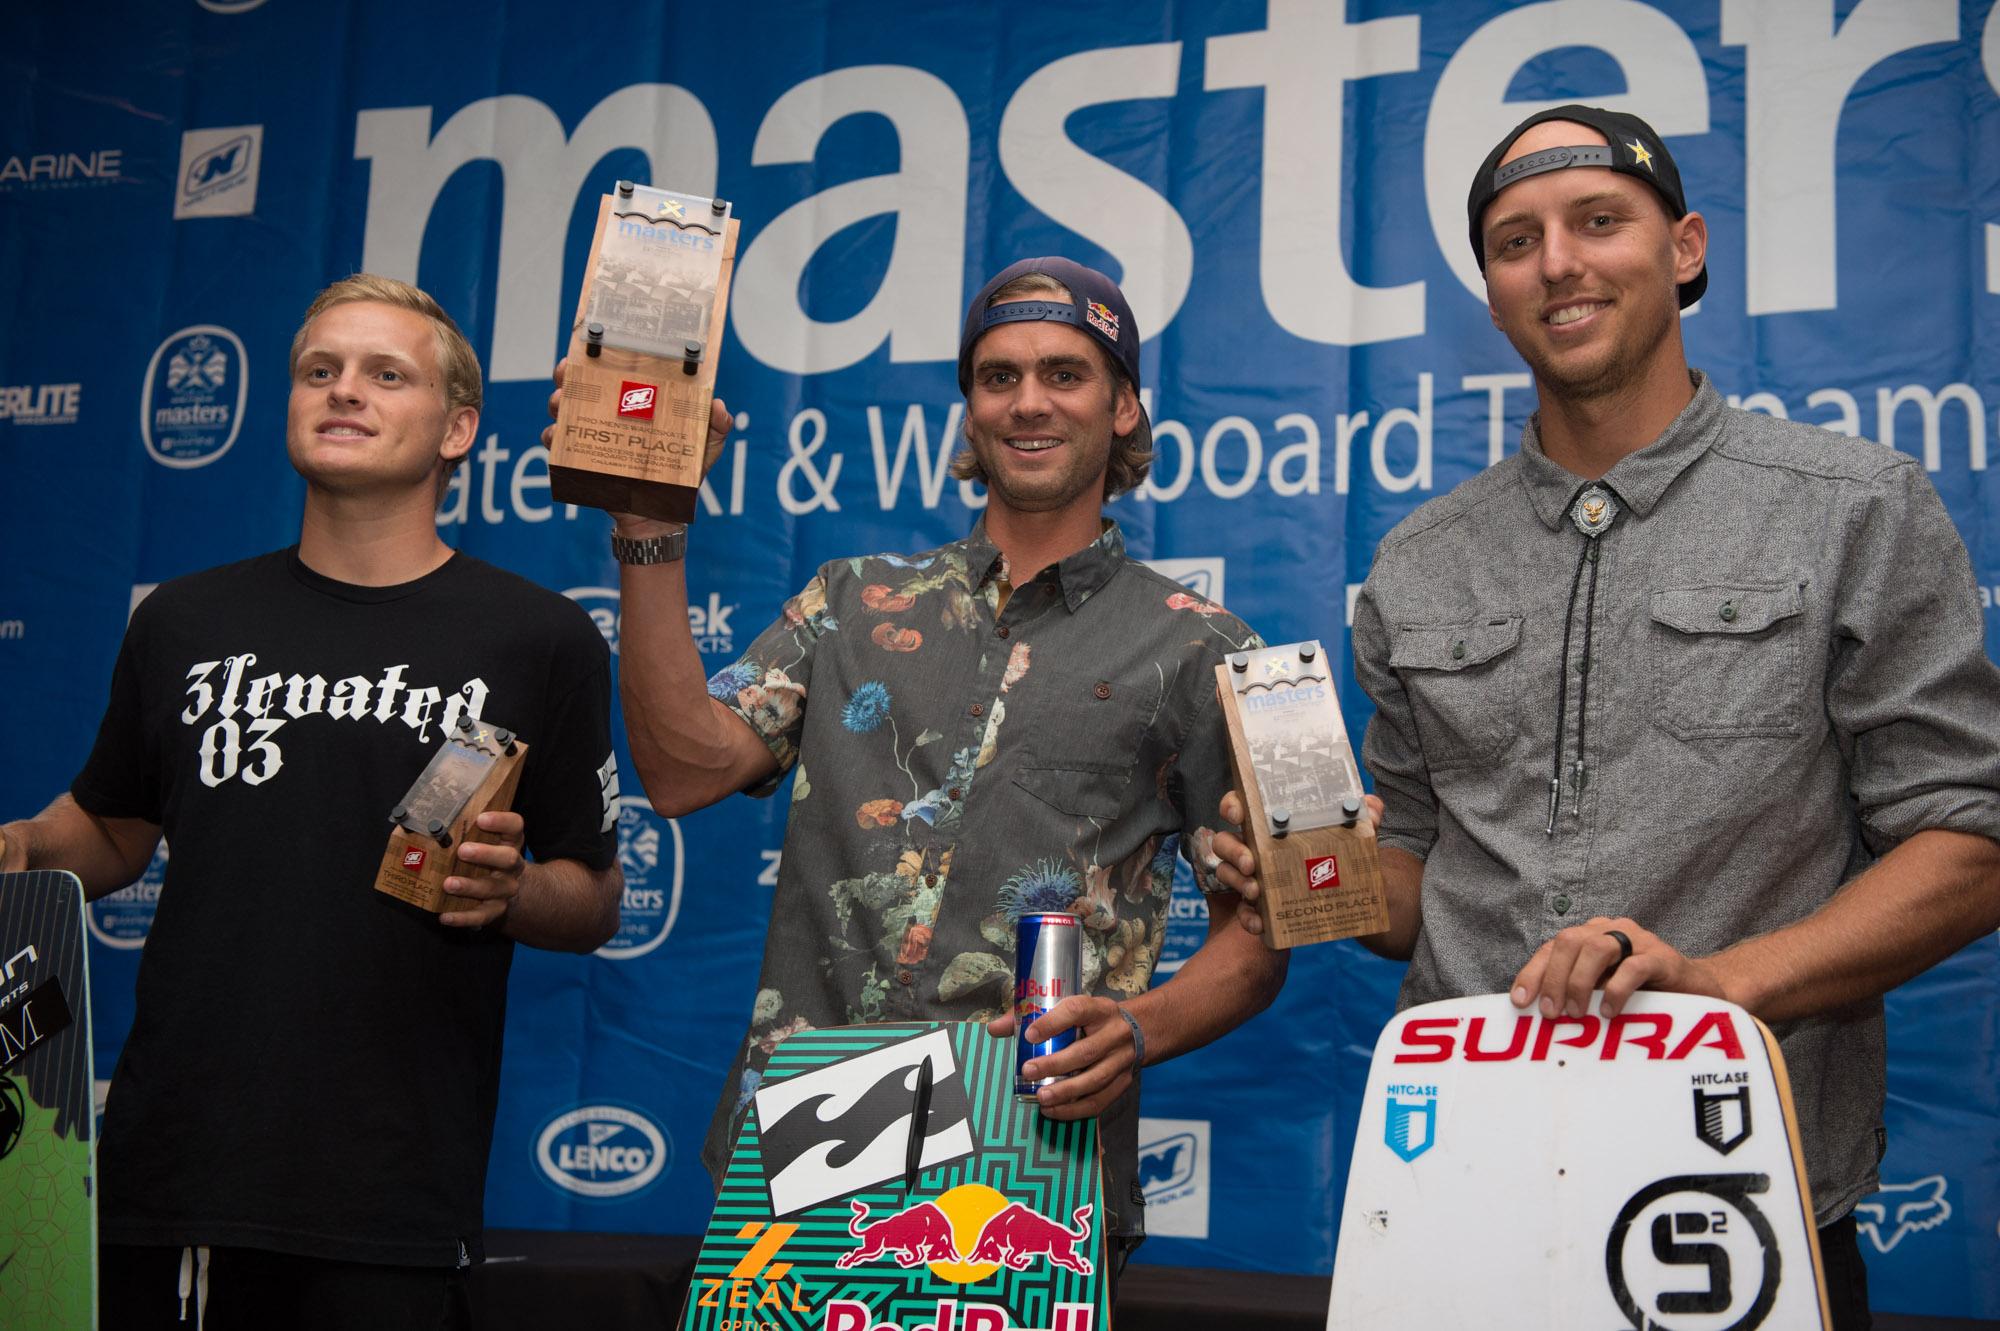 3x Masters Champ // photo courtesy Nautique Boats, Inc. / Aaron Katen